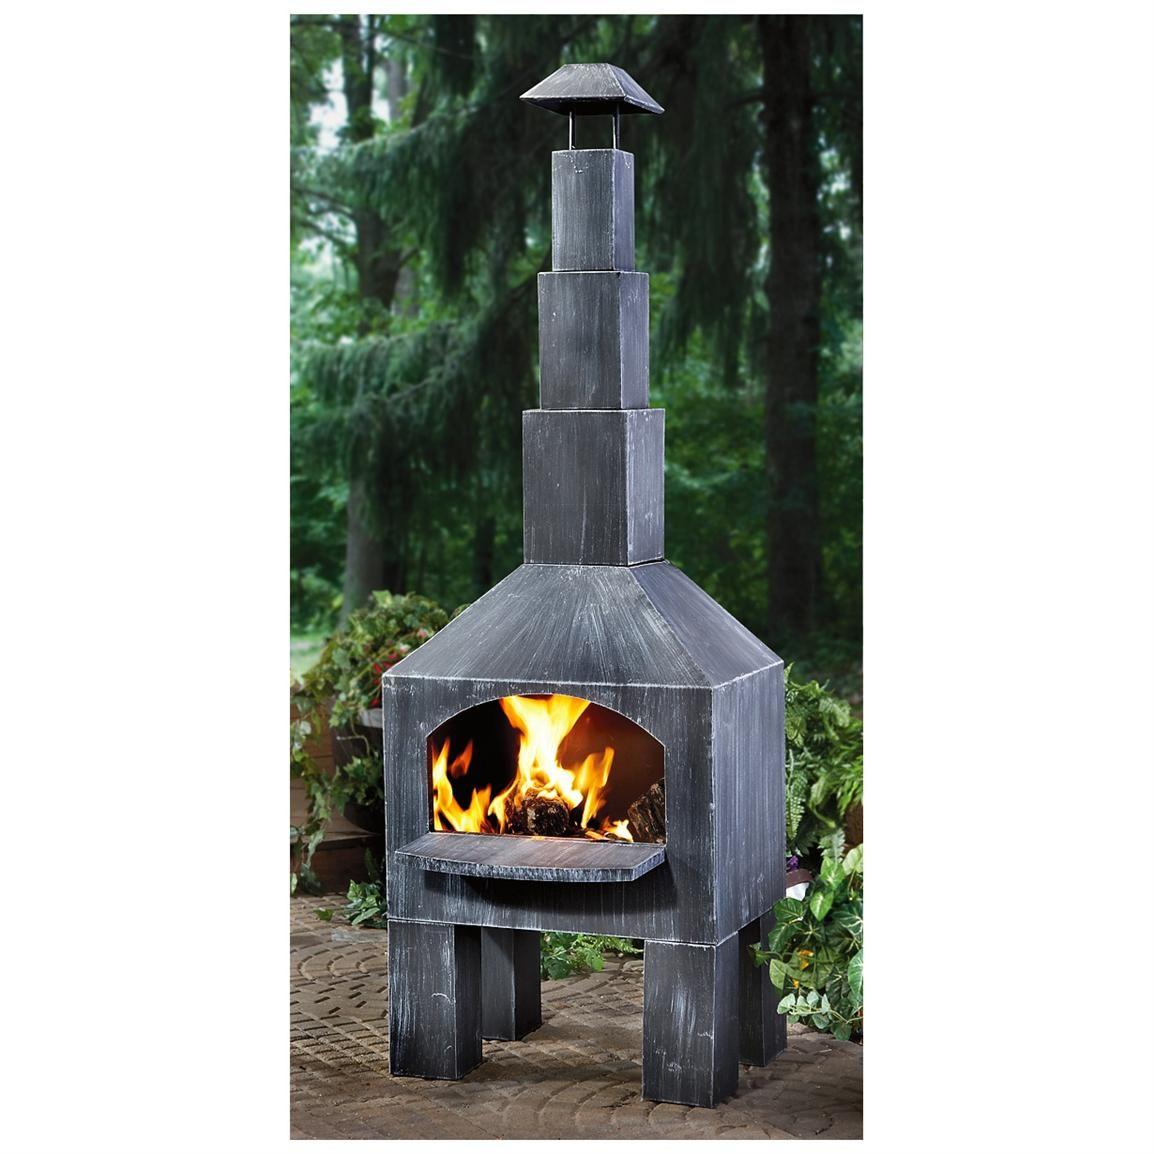 CASTLECREEK Outdoor Cooking Steel Chiminea